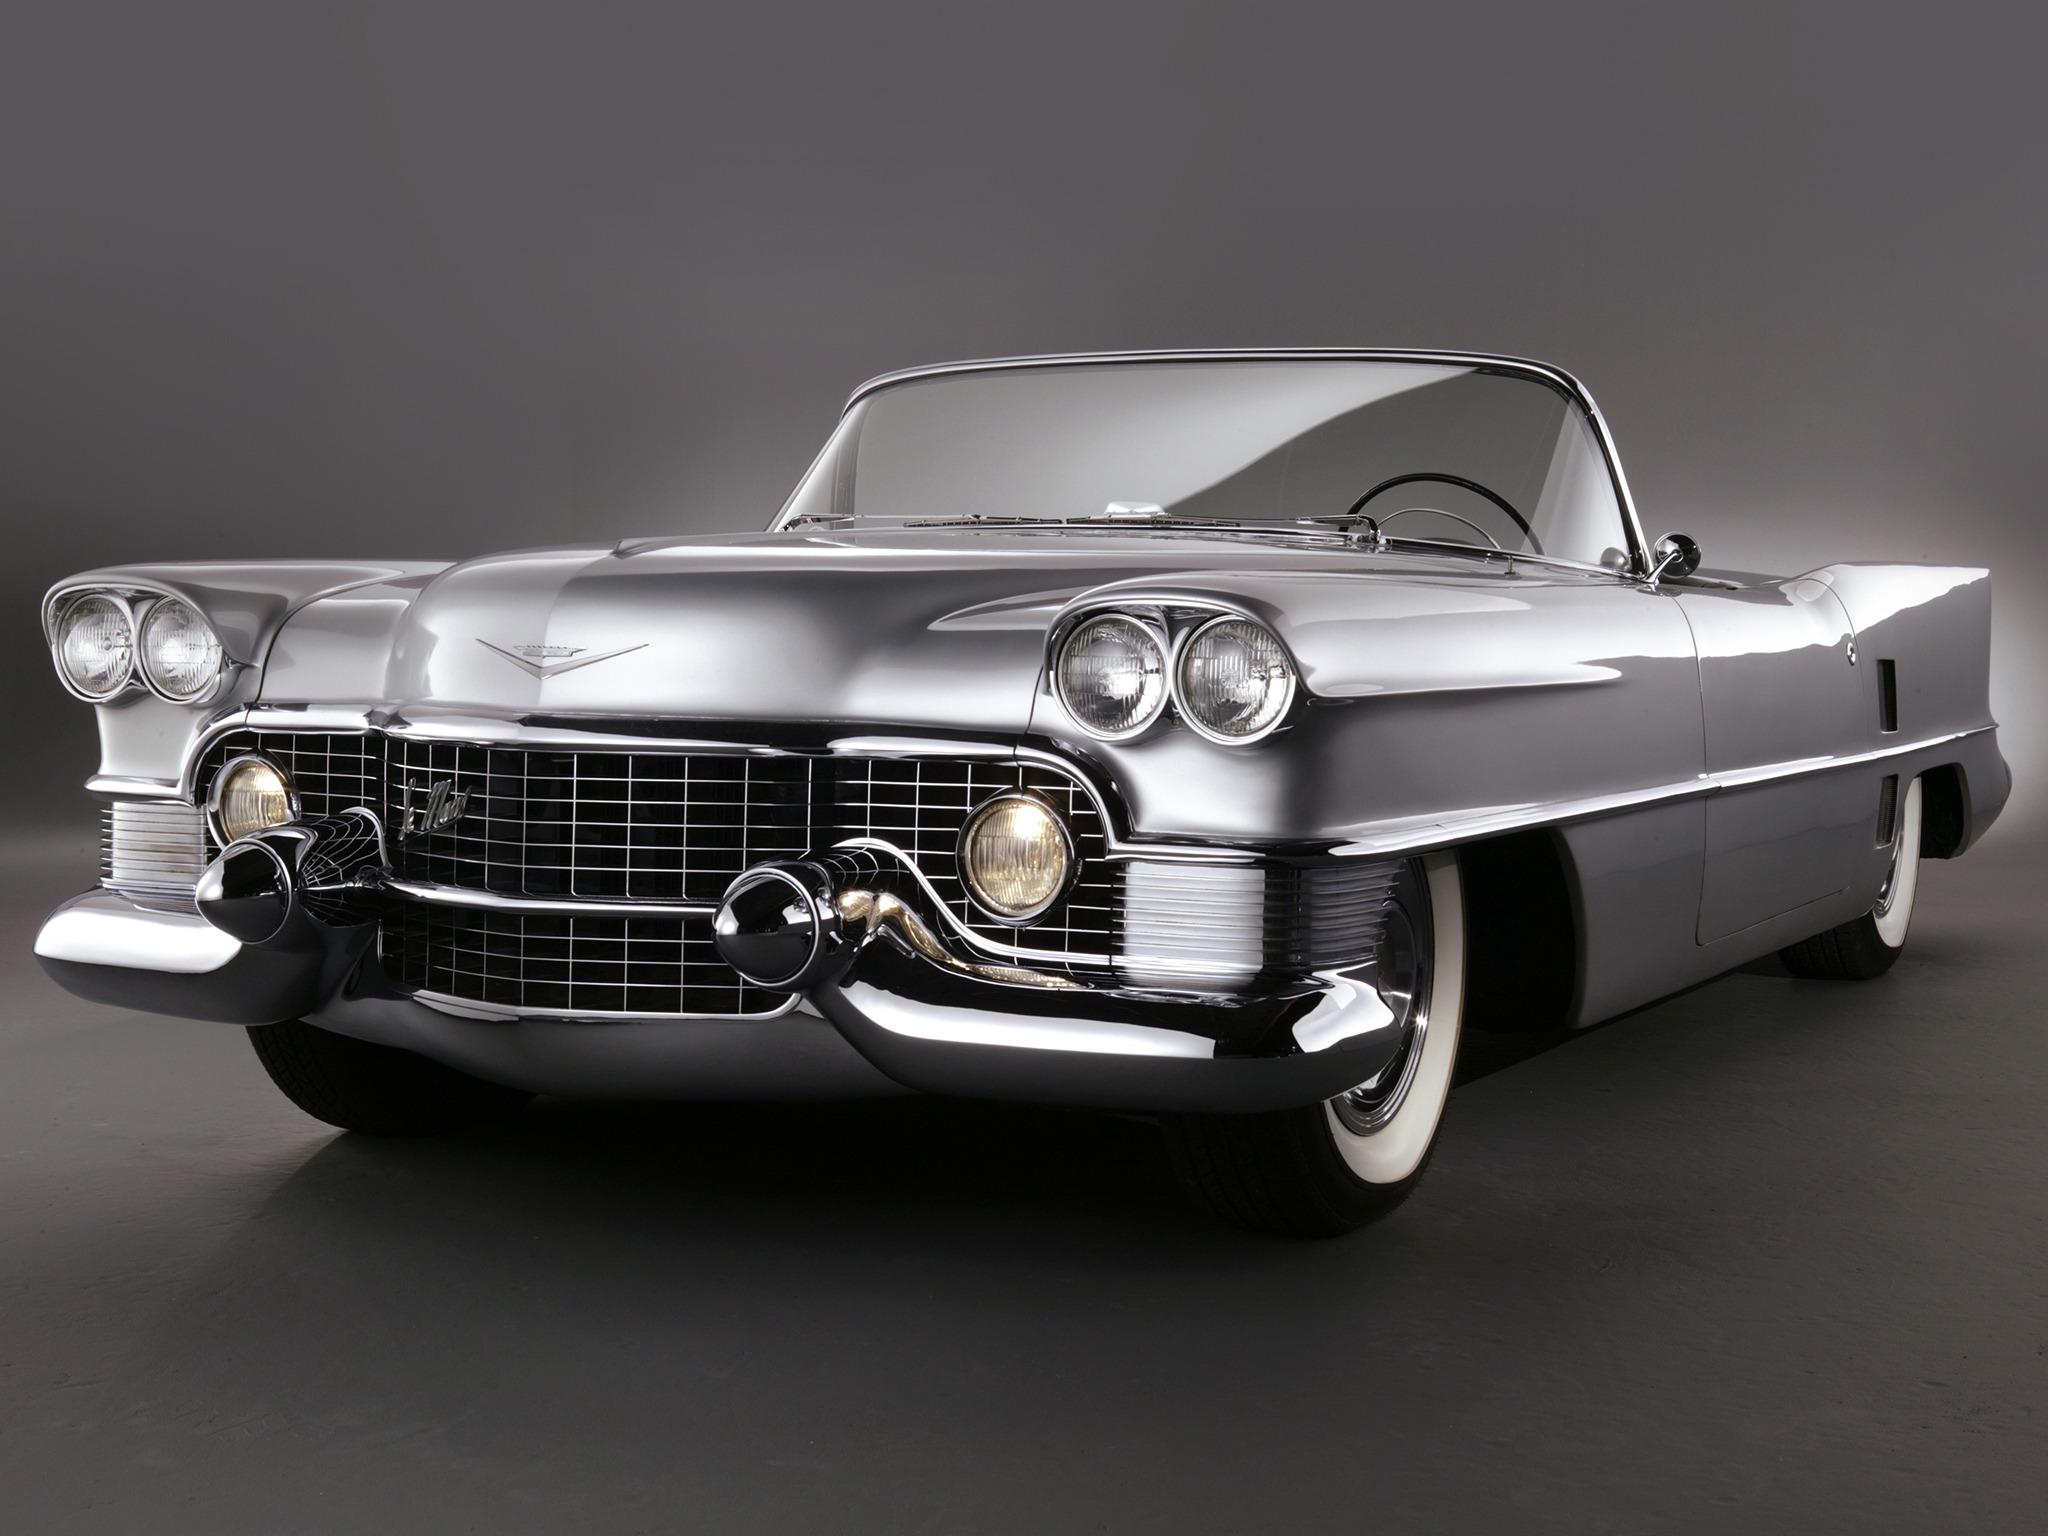 cadillac le mans concept car 4 1959 old concept cars. Black Bedroom Furniture Sets. Home Design Ideas